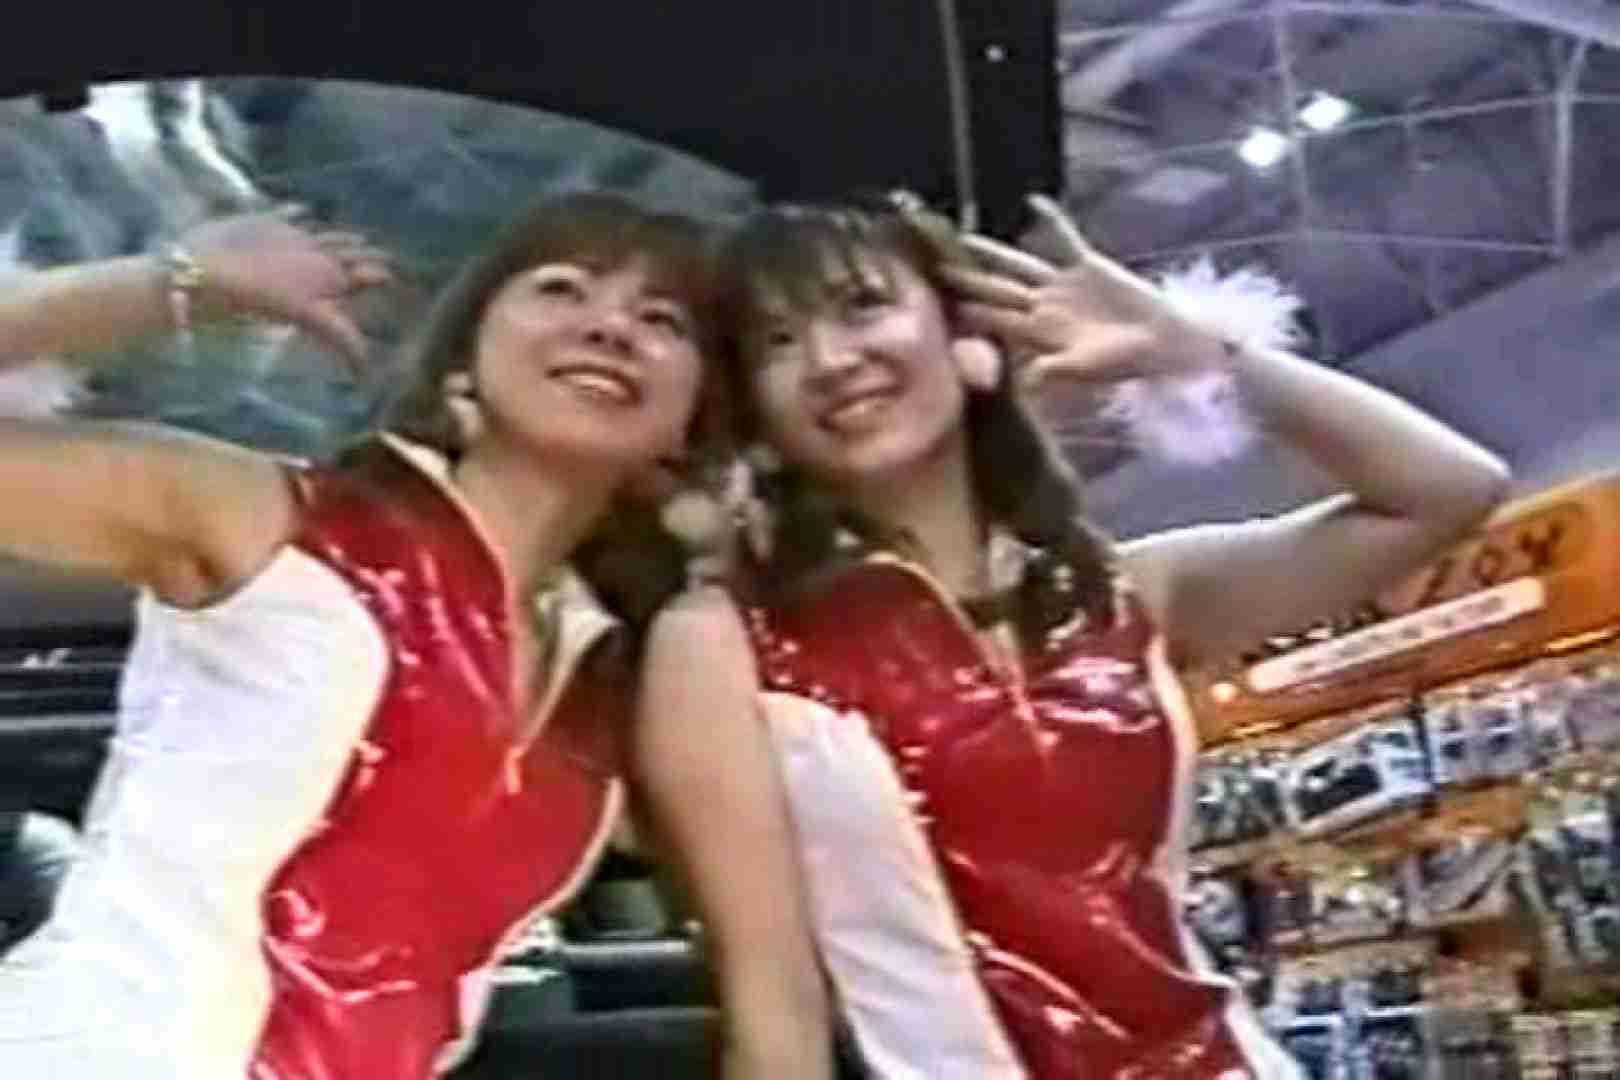 RQカメラ地獄Vol.20 現役ギャル AV無料動画キャプチャ 98pic 2